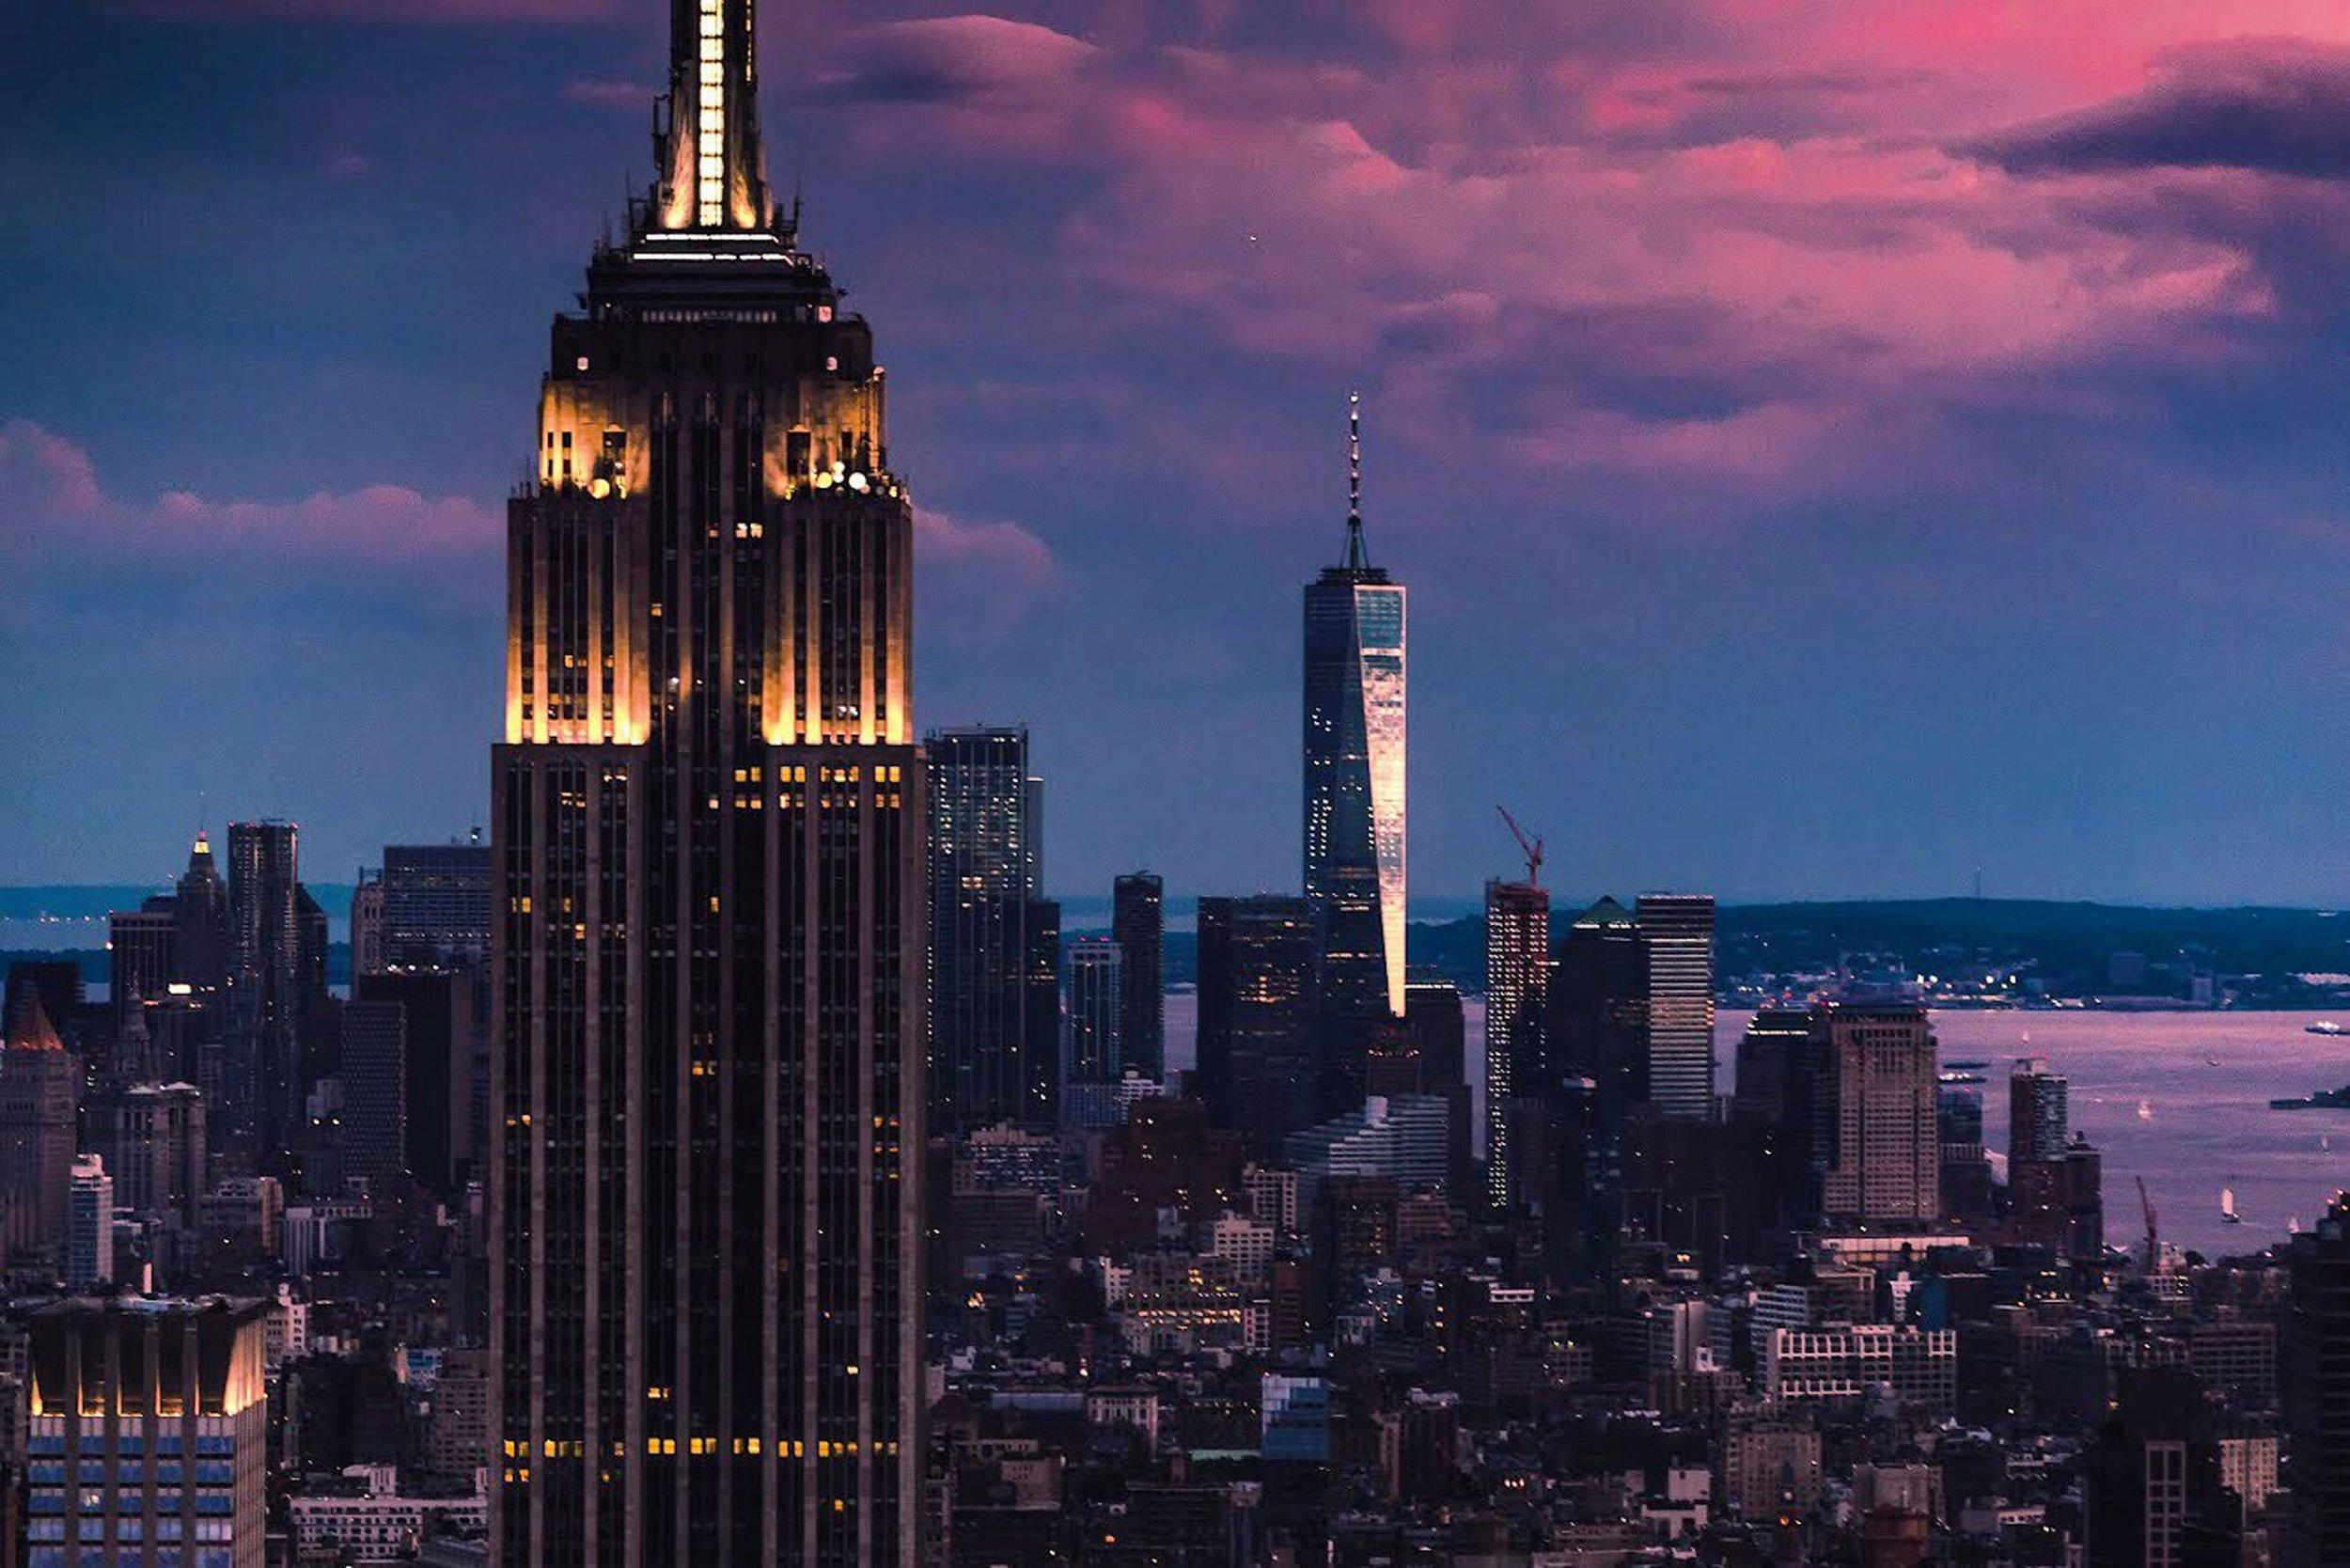 The fabulous New York City of my dreams. Photo credit: Tom Ritson, Unsplash